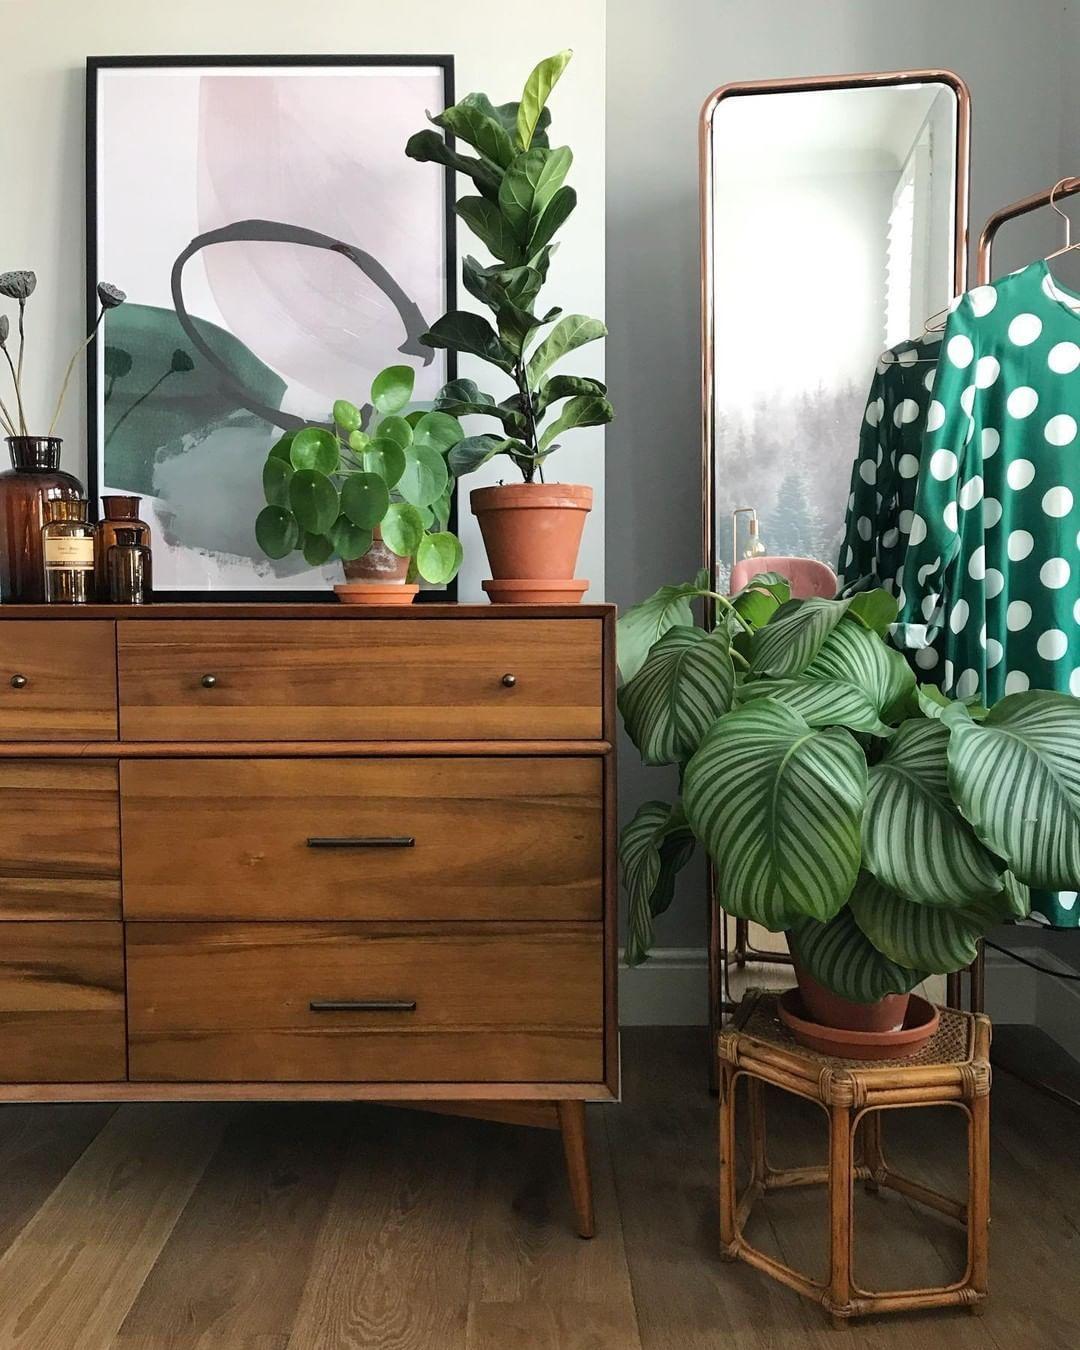 West Elm Furniture Decor On Instagram Bring Your Wardrobe To